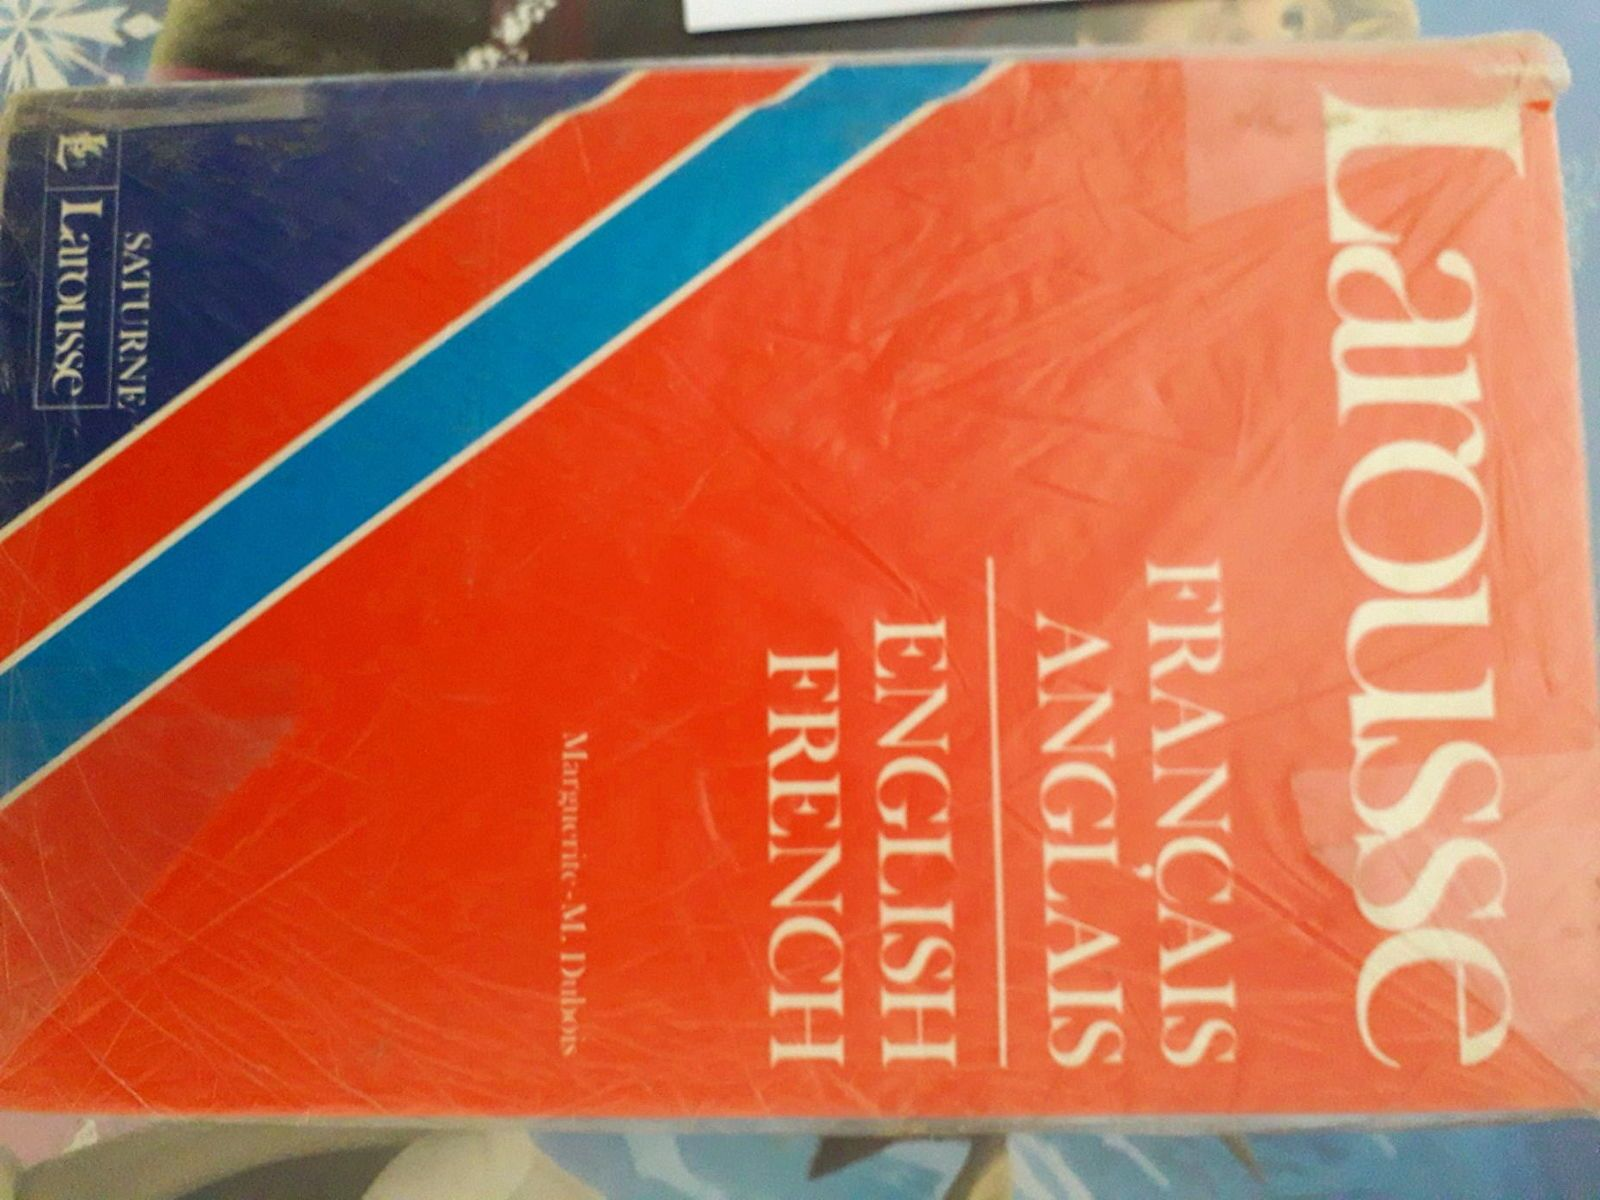 Vends dictionnaire Francais/Anglais